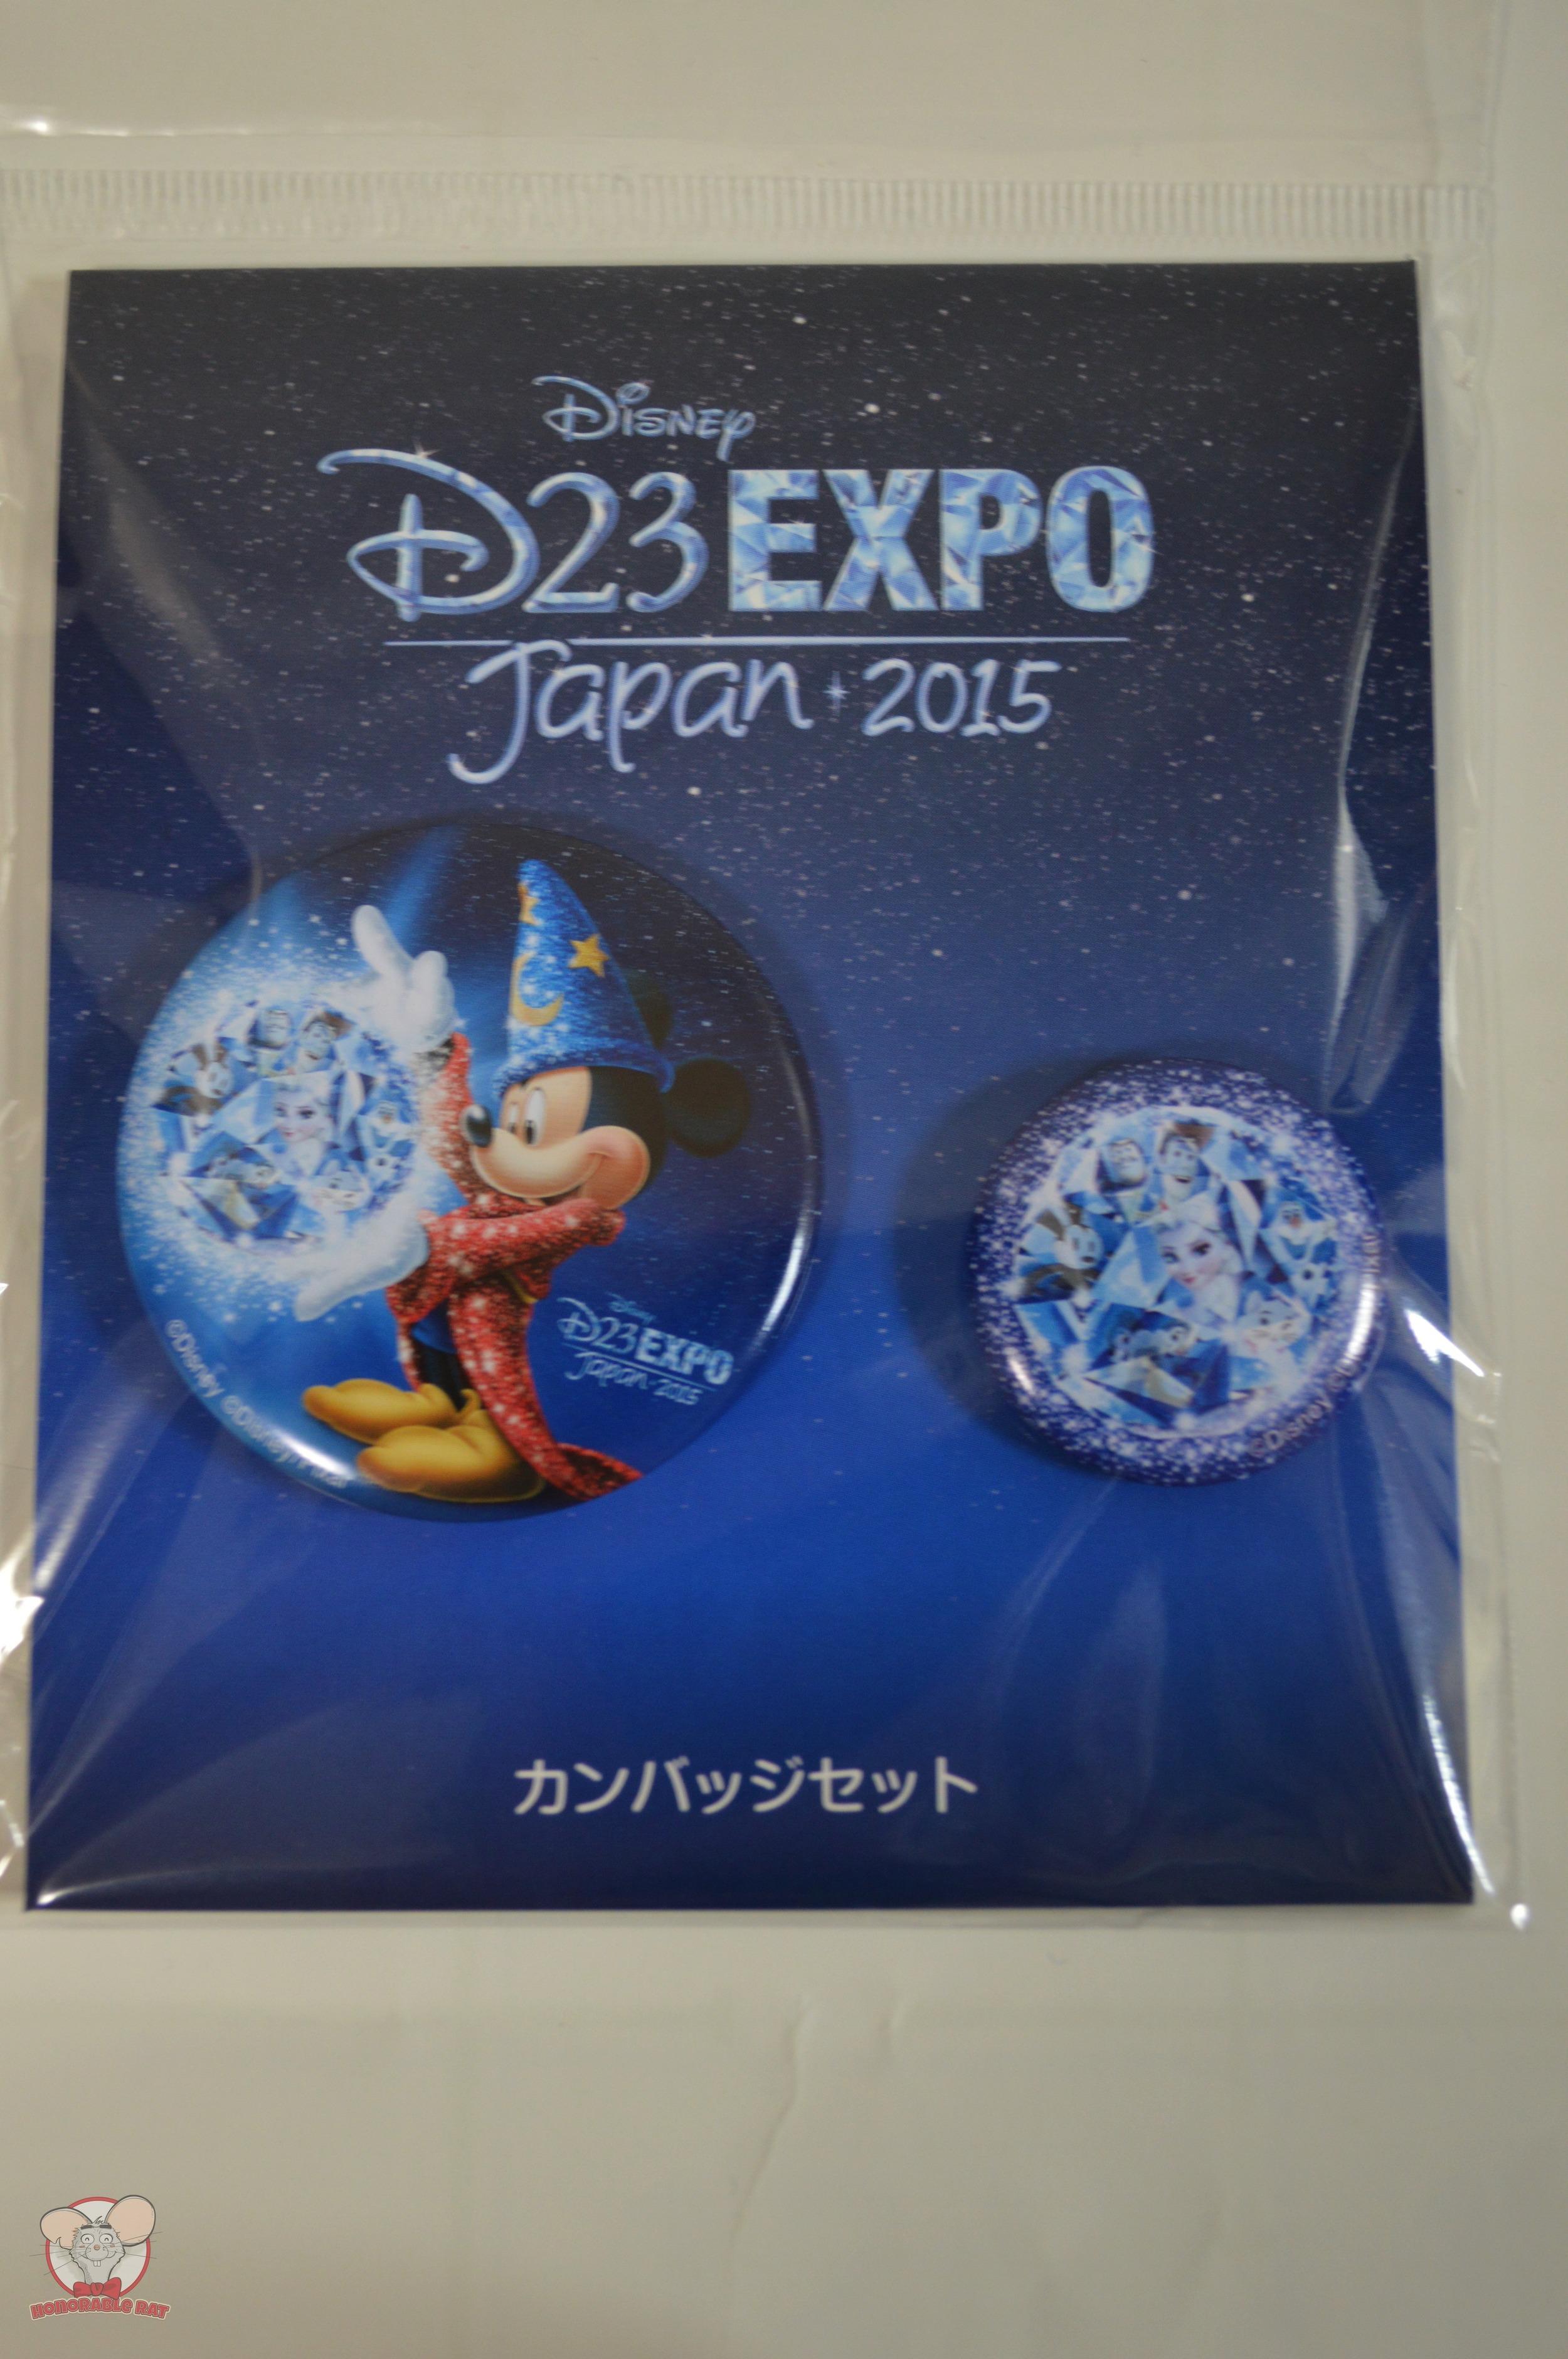 D23 Expo Japan 2015 Set of 2 Button Badges